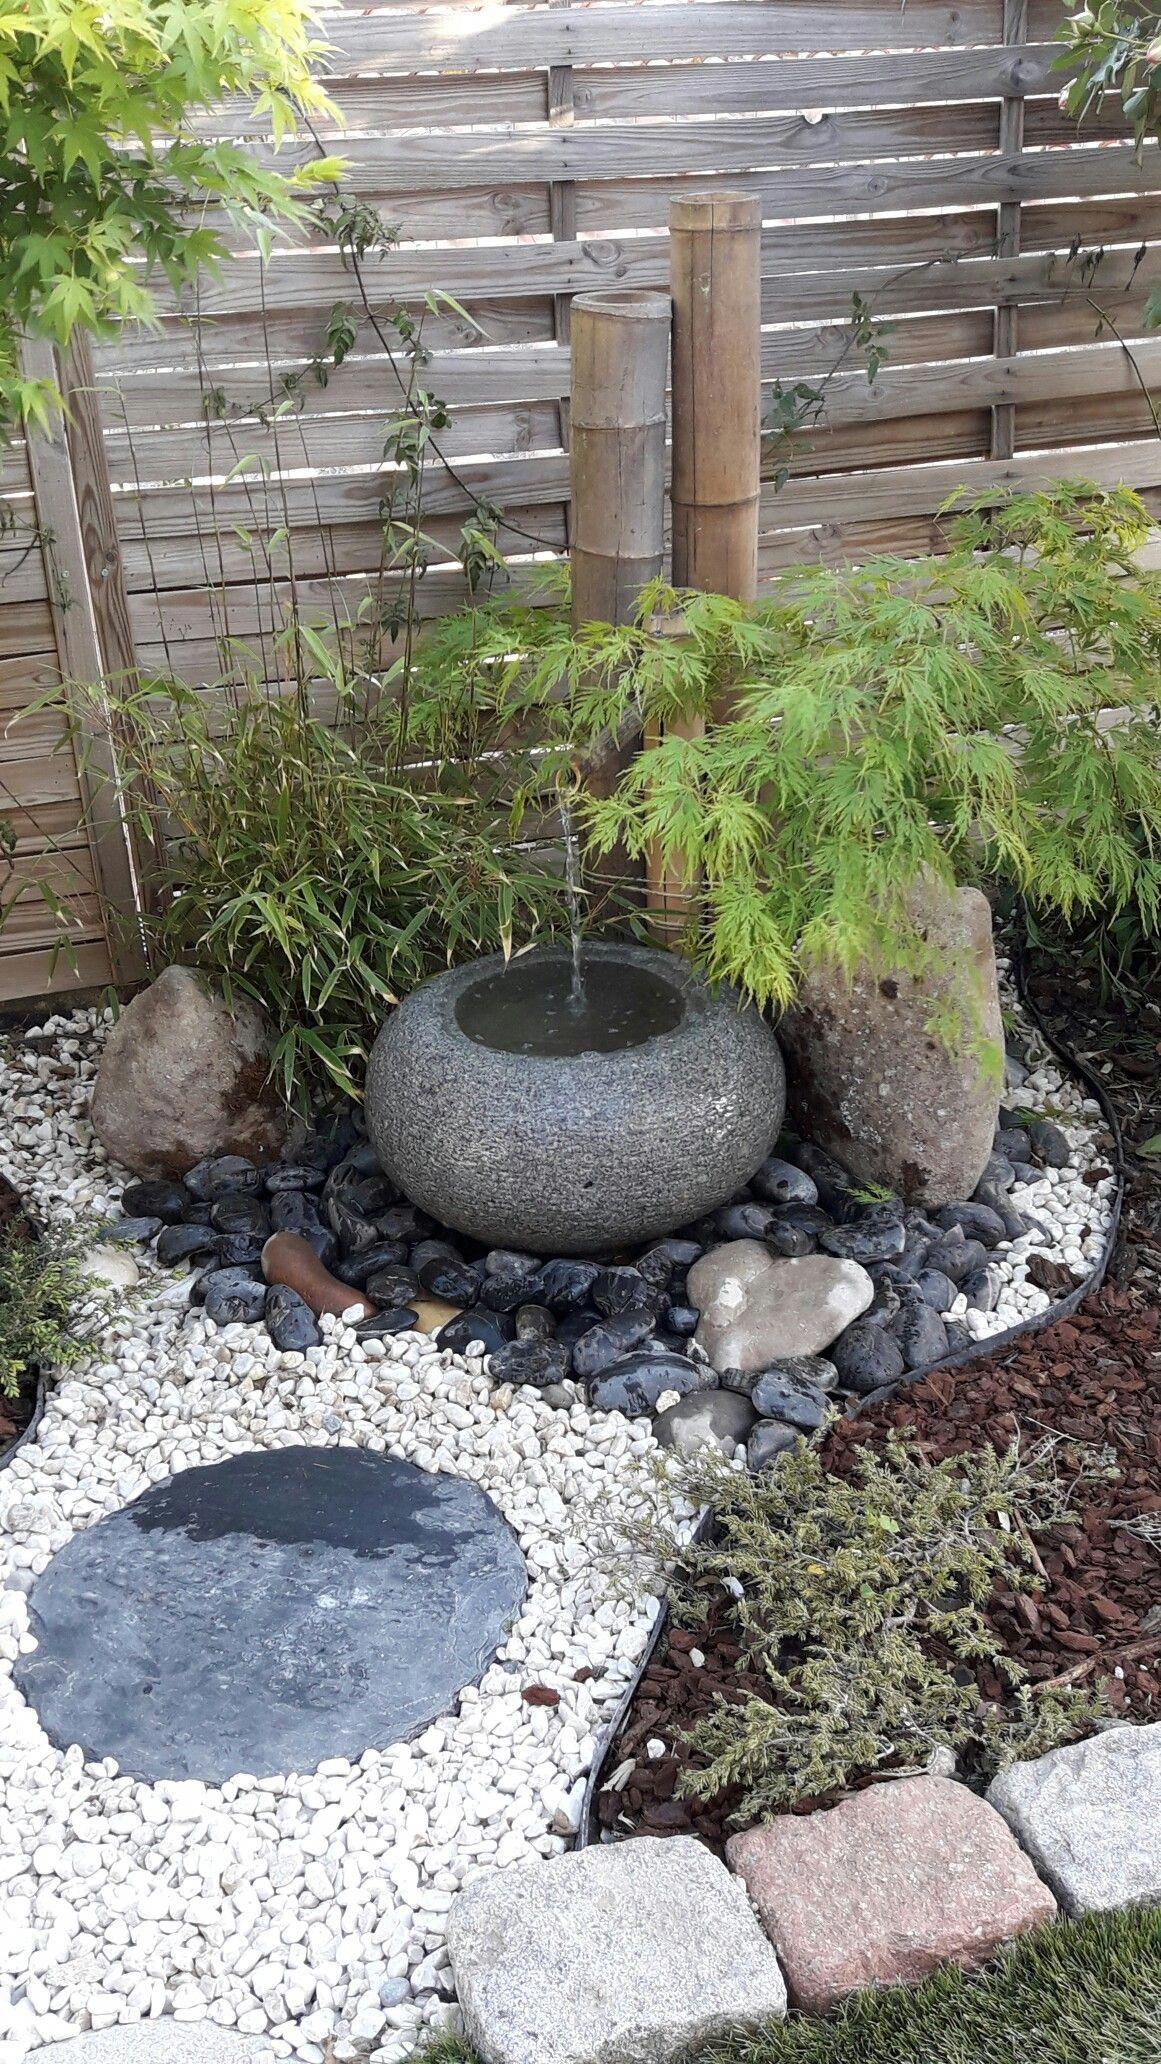 Mon Petit Coin Zen Japanesegardening Small Japanese Garden